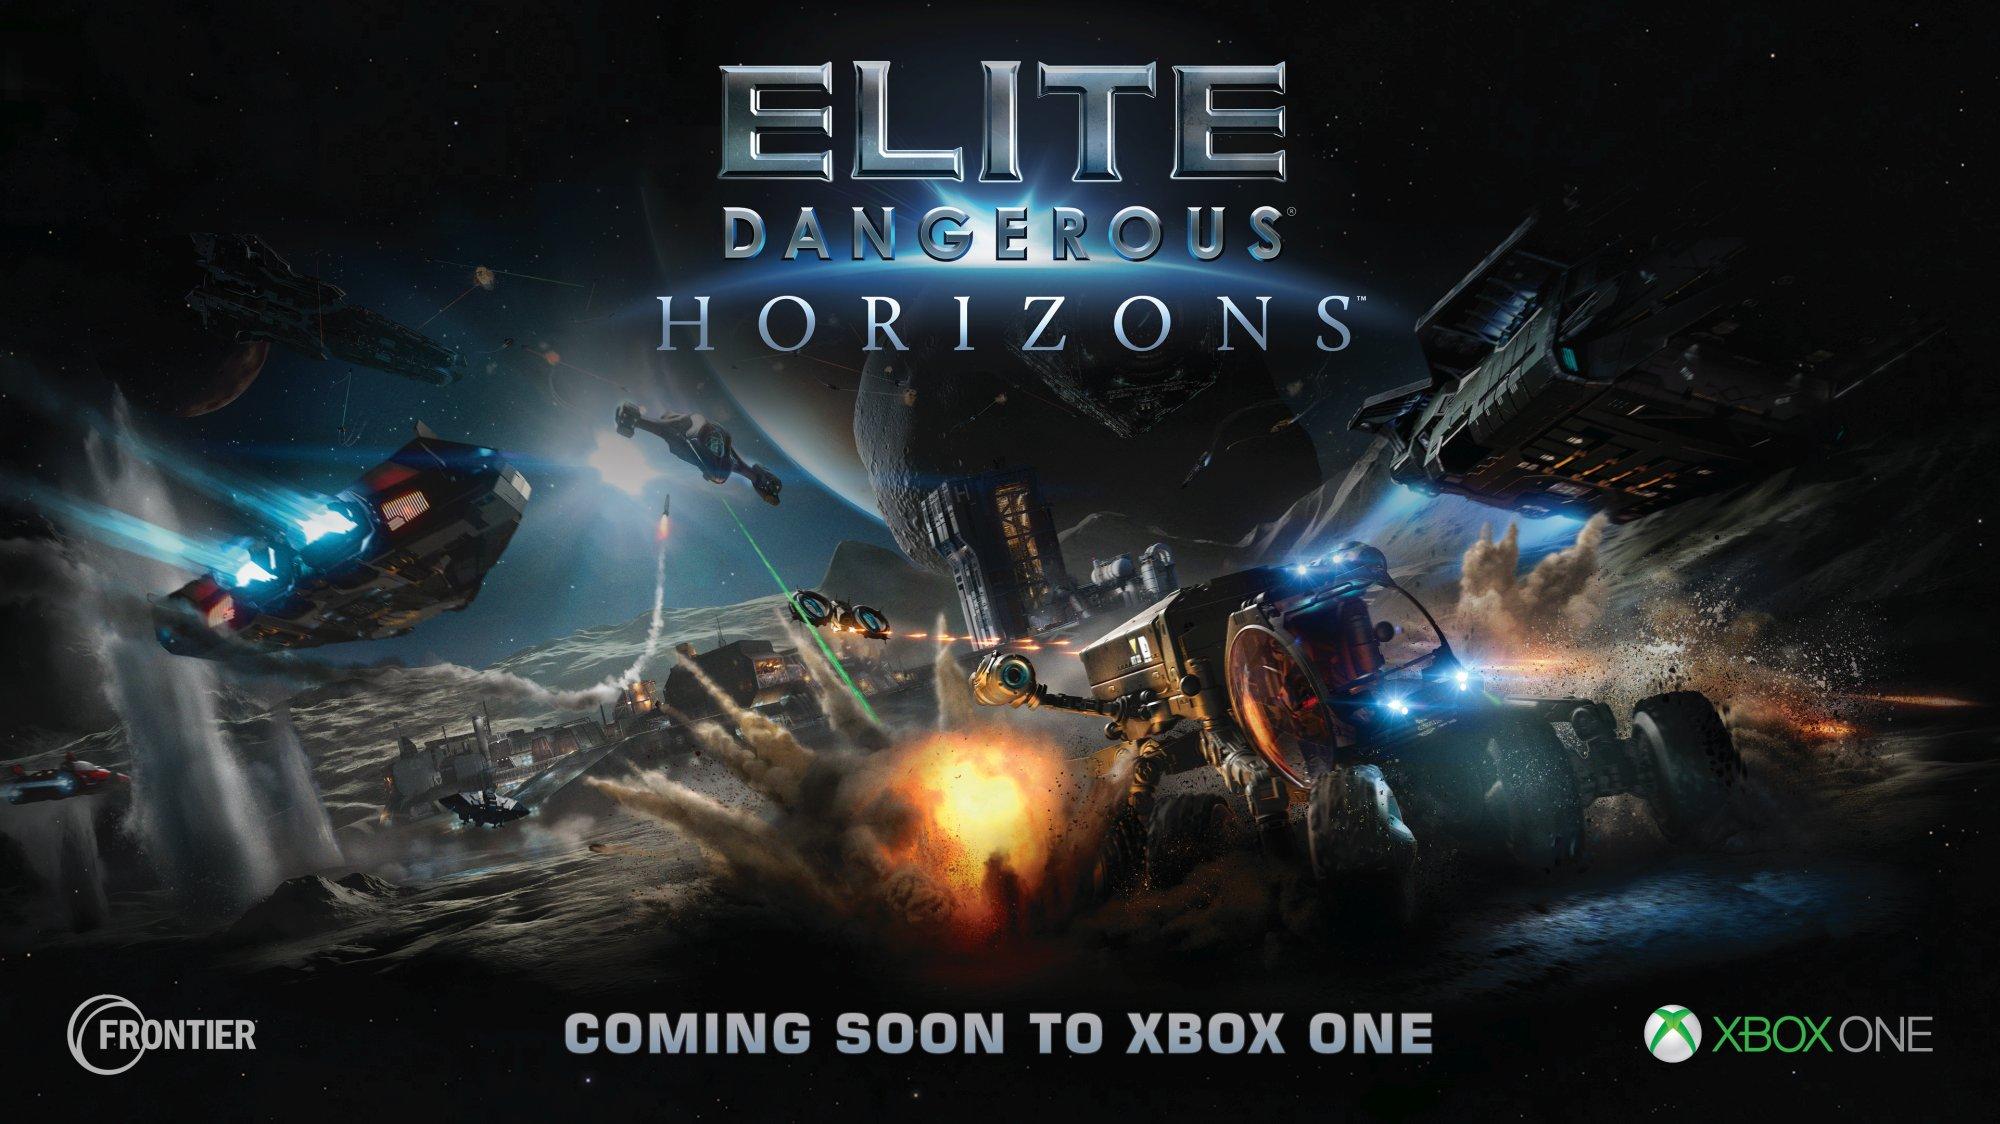 Elite - Dangerous Horizons